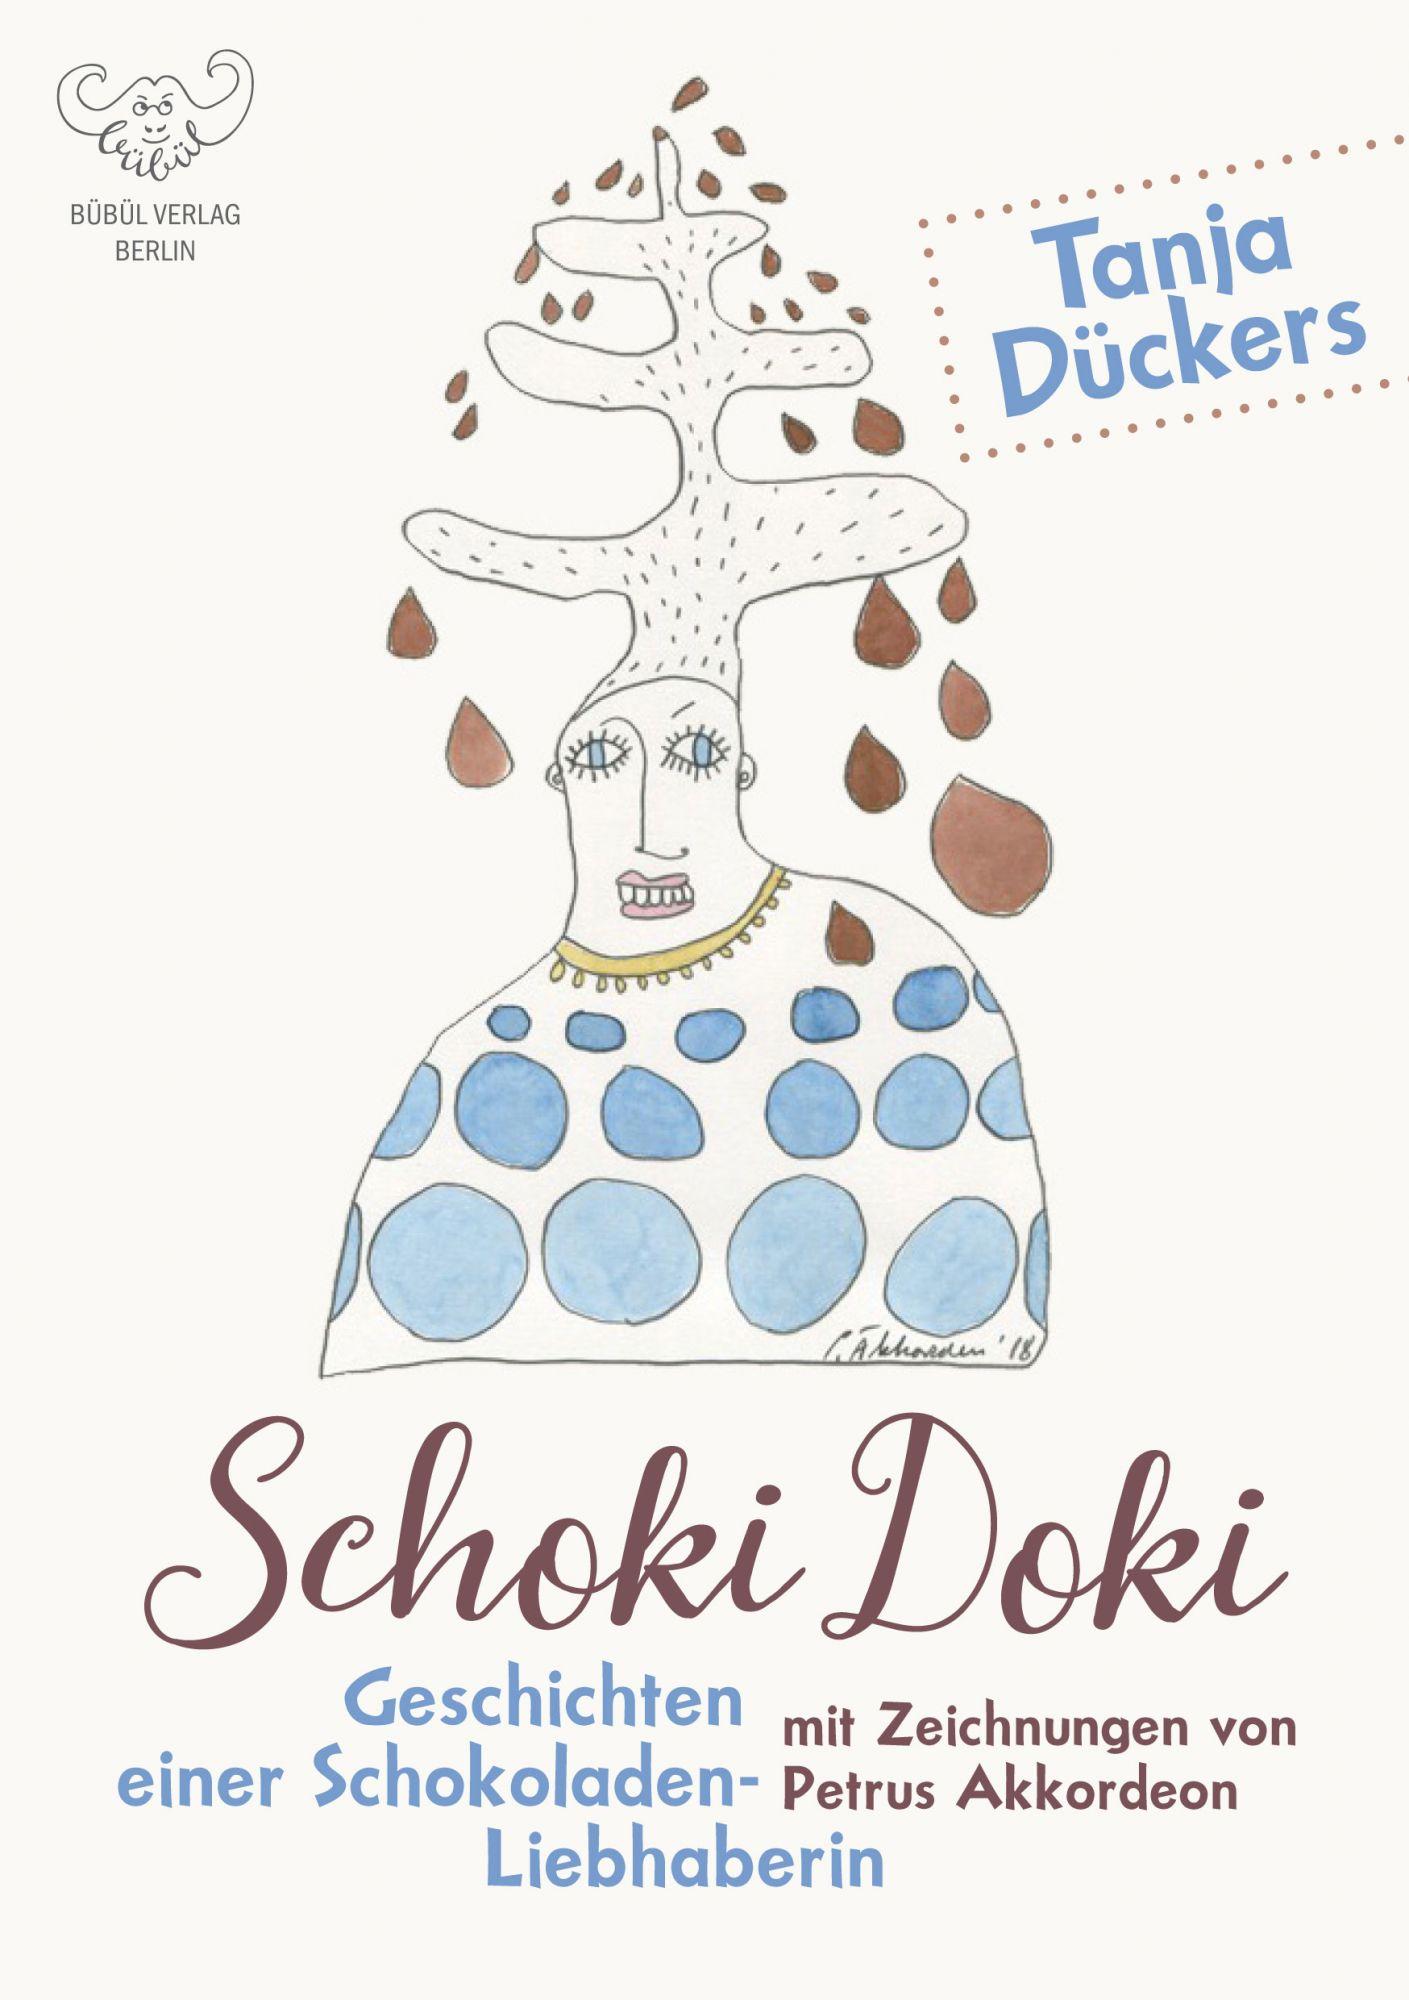 Tanja Dückers & Petrus Akkordeon: Schoki Doki